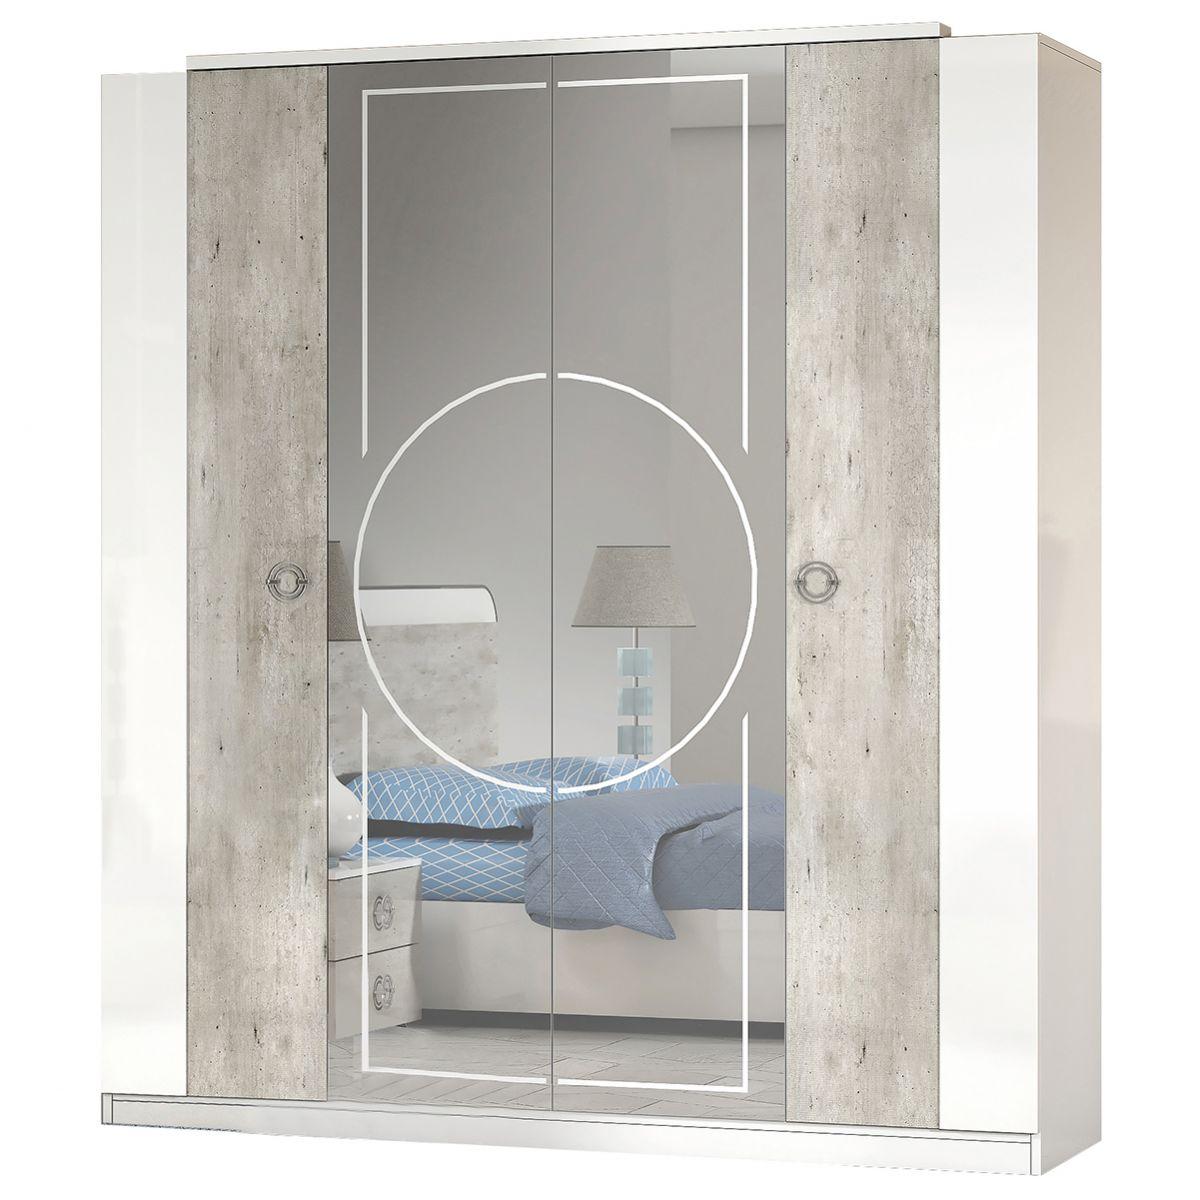 Altobuy Goya Armoire 4 Portes Avec Miroir Central Neuf Ebay